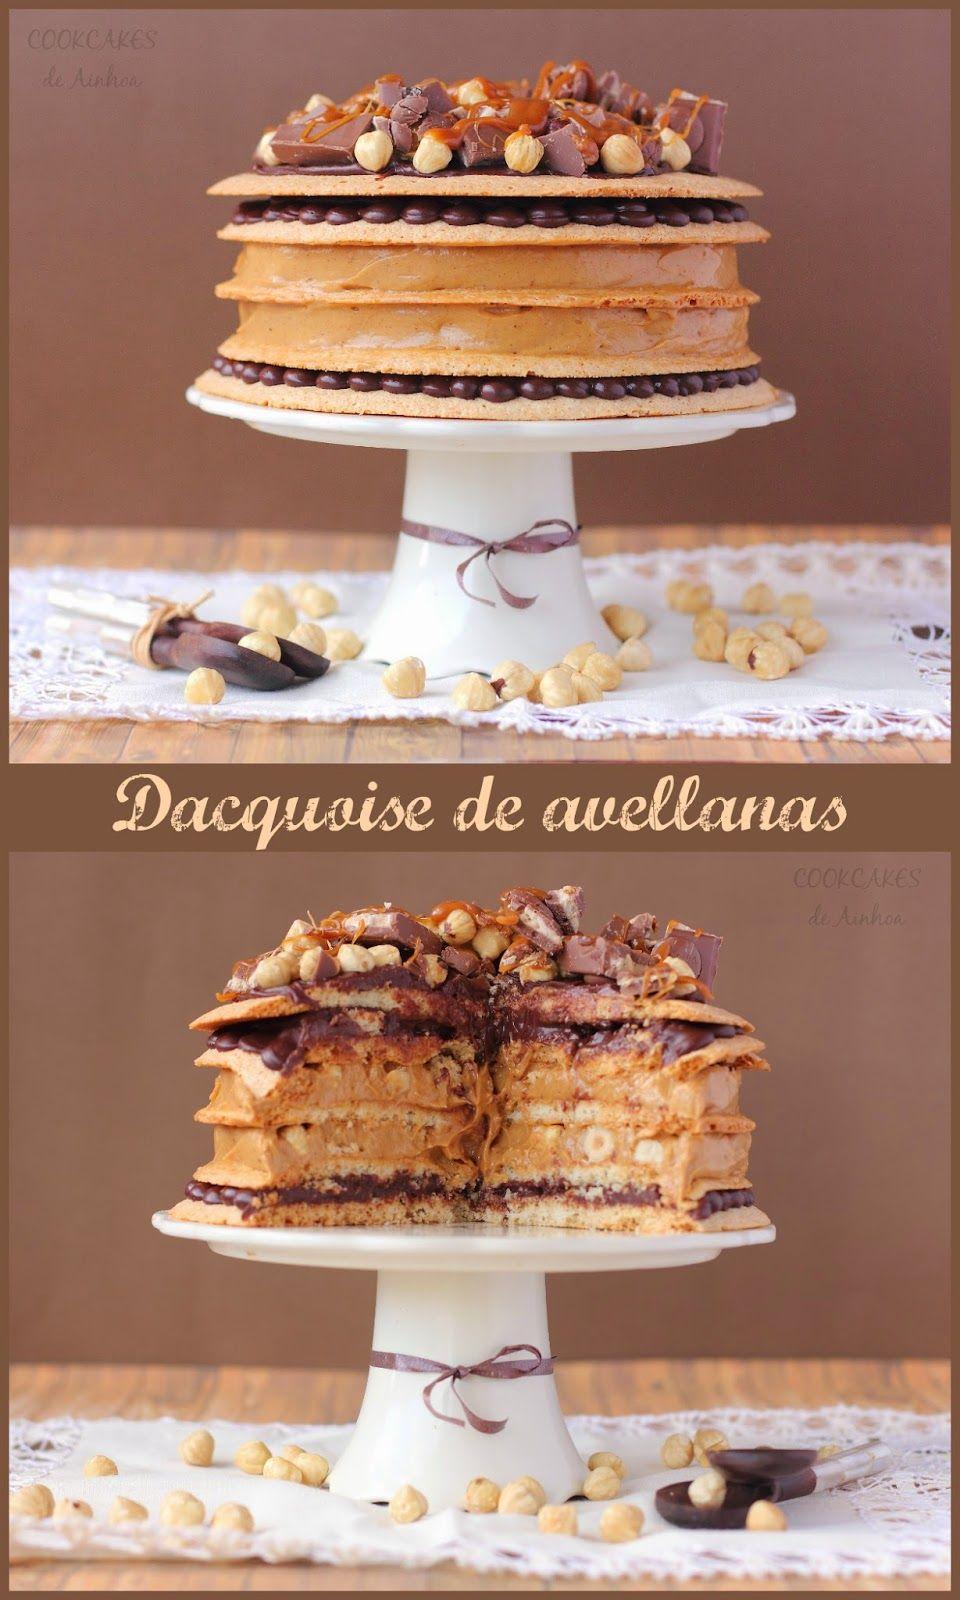 Cookcakes de Ainhoa: DACQUOISE DE AVELLANAS